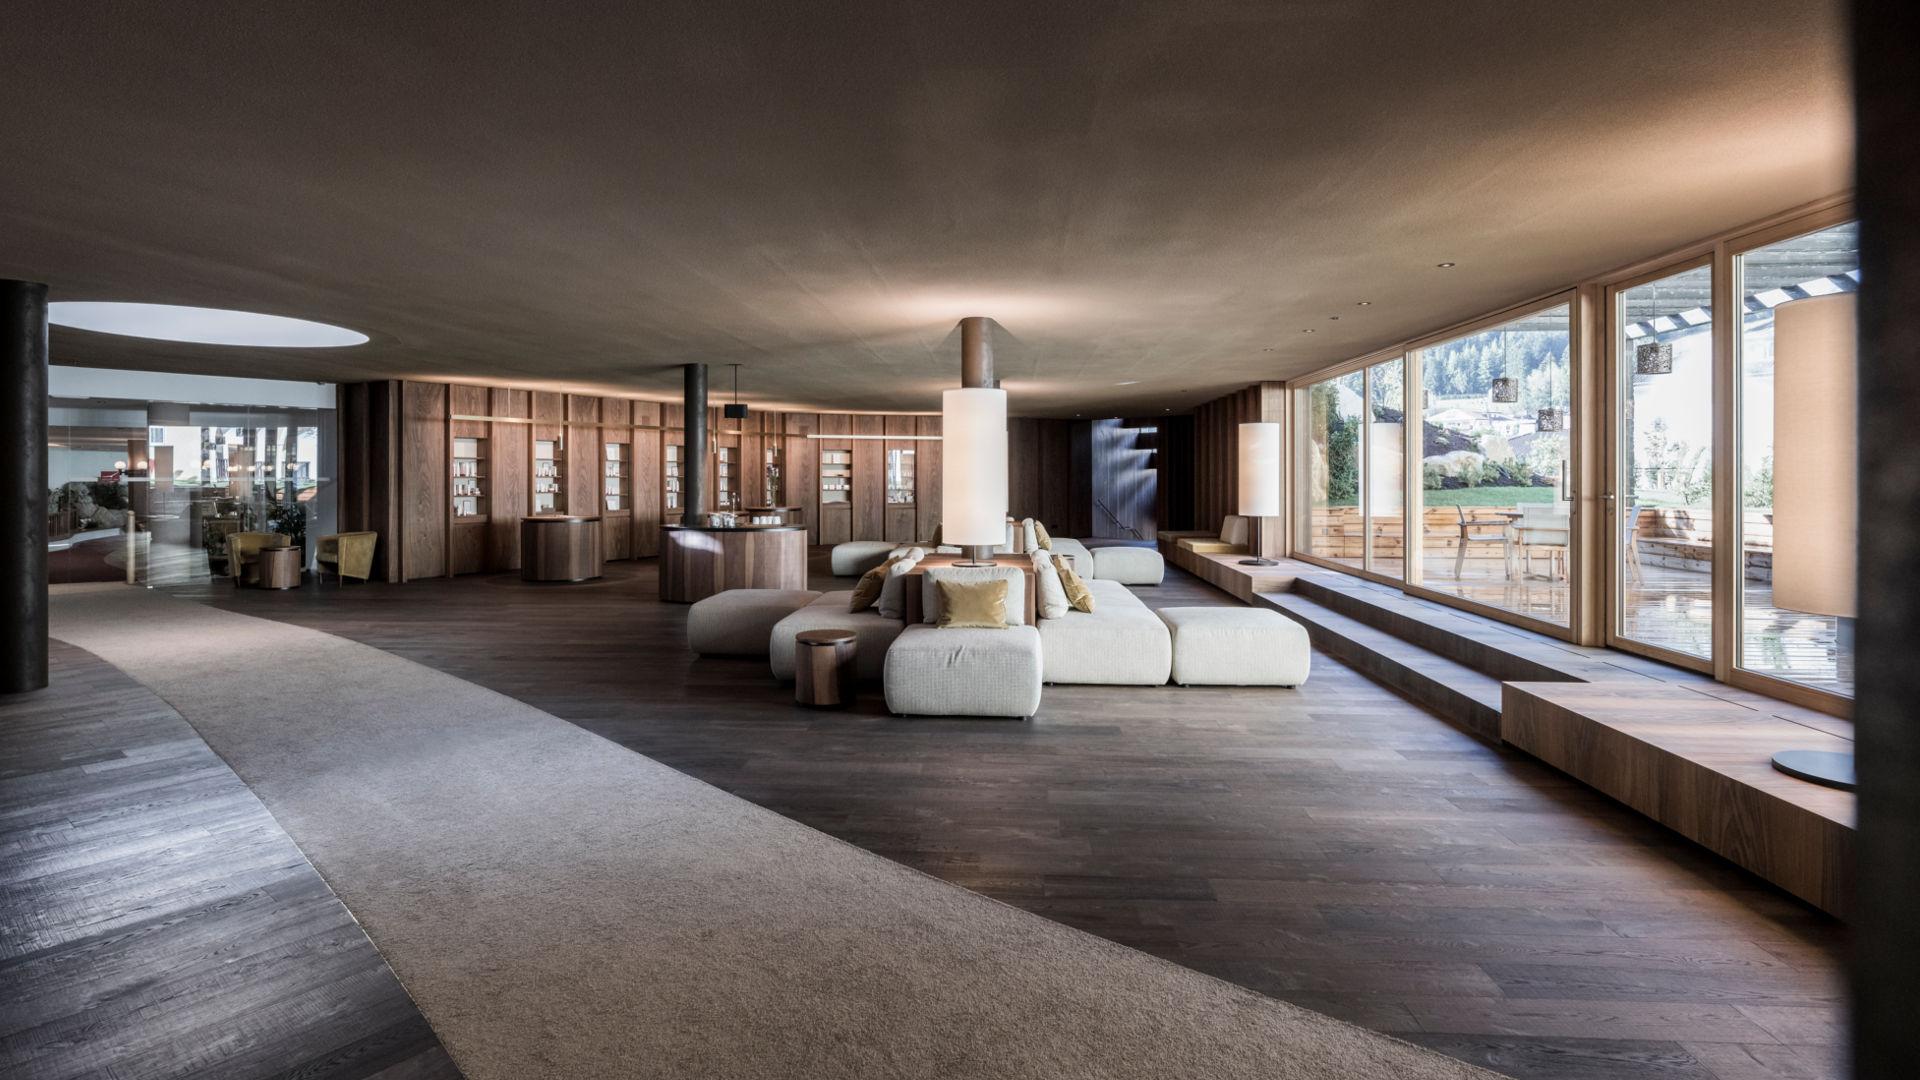 Hotel Adler Dolomiti - Spa & Benessere Hotel - Sala relax